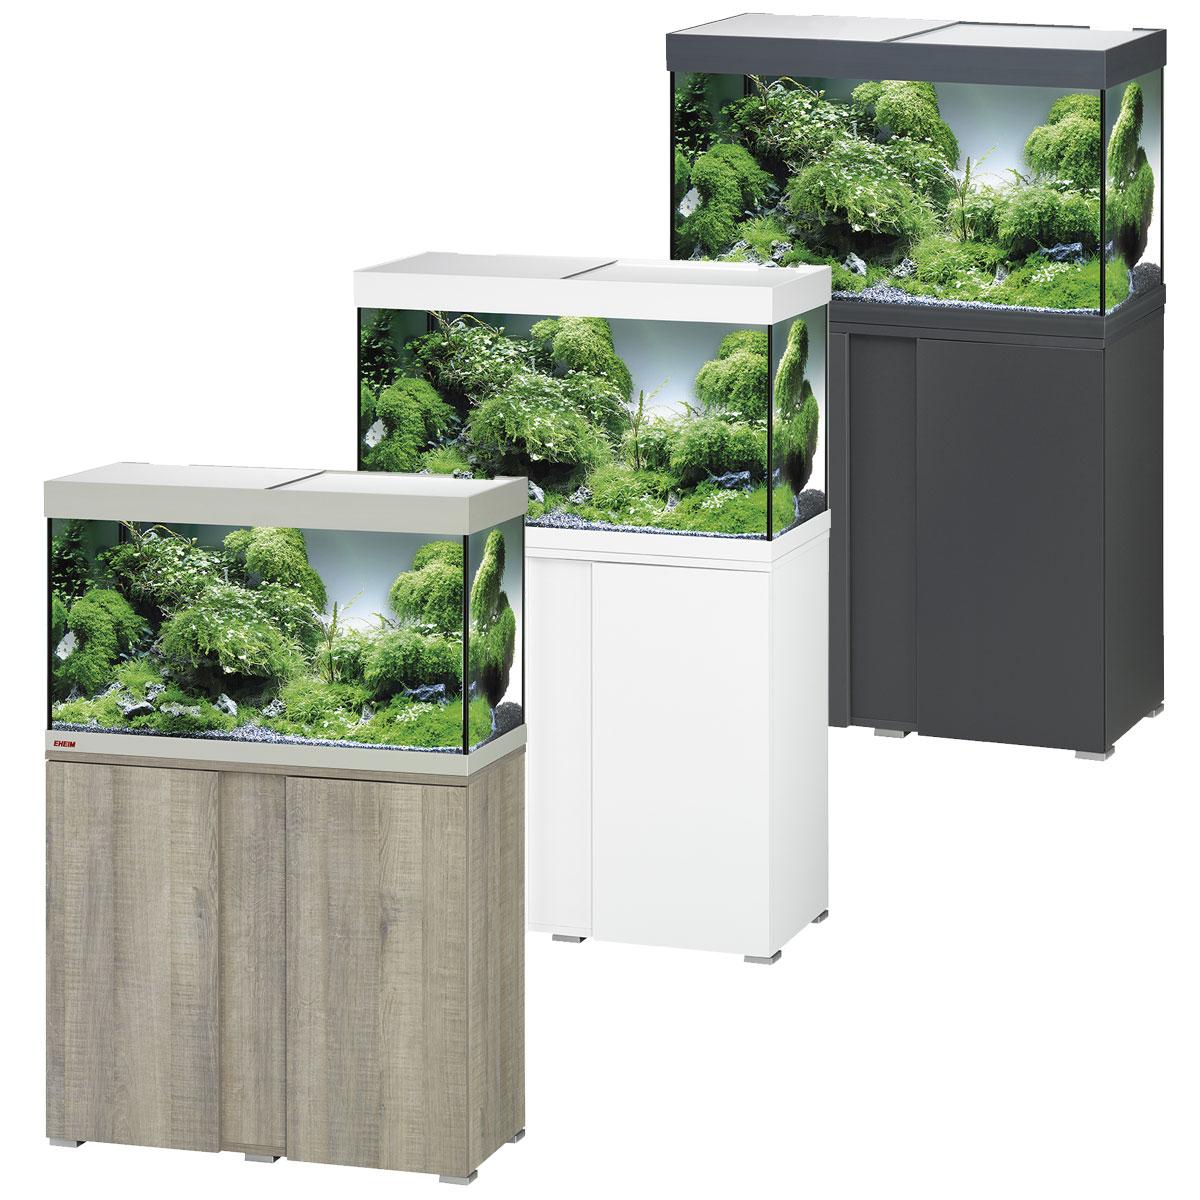 eheim vivaline komplettaquarium mit led 126 liter bei zooroyal. Black Bedroom Furniture Sets. Home Design Ideas